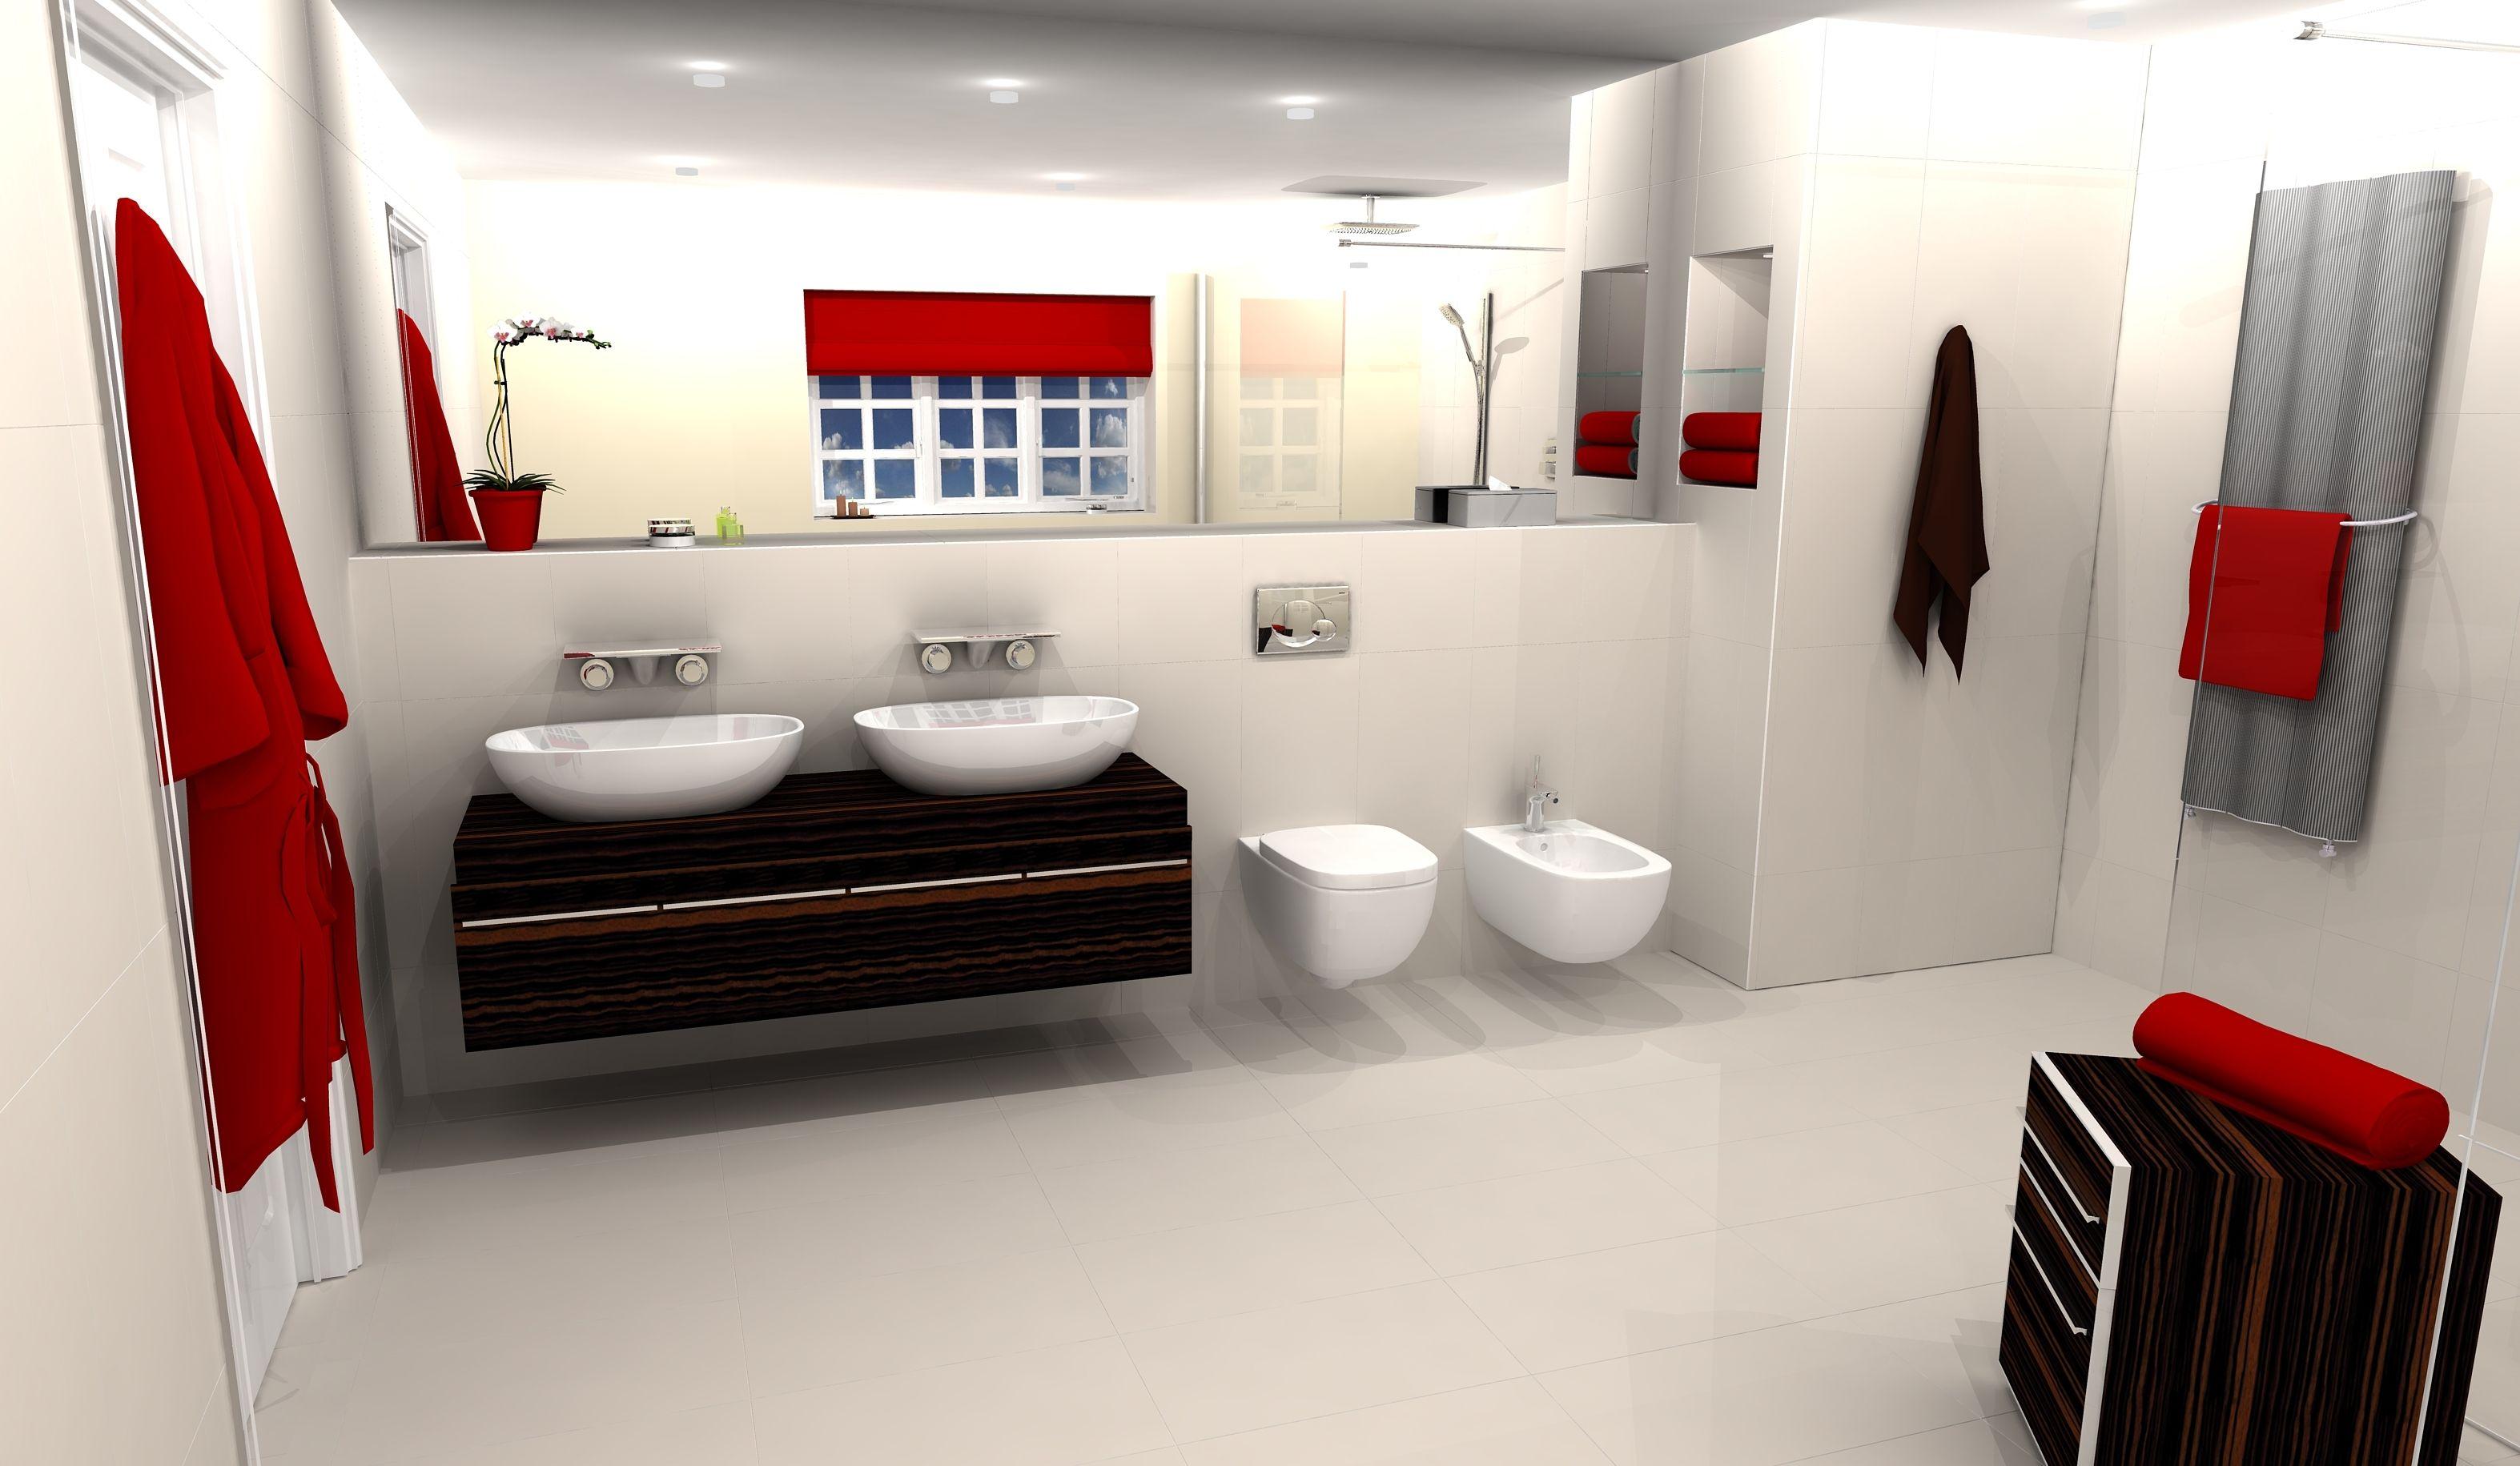 Design Your Own Virtual Bathroom Peachy Online Free Rukinet Com Interior Netriciaus Design Your Own Restaurant Floor Plan Inspirational Interior Desain Kamar Mandi Modern Desain Interior Kamar Mandi Interior Kamar Mandi